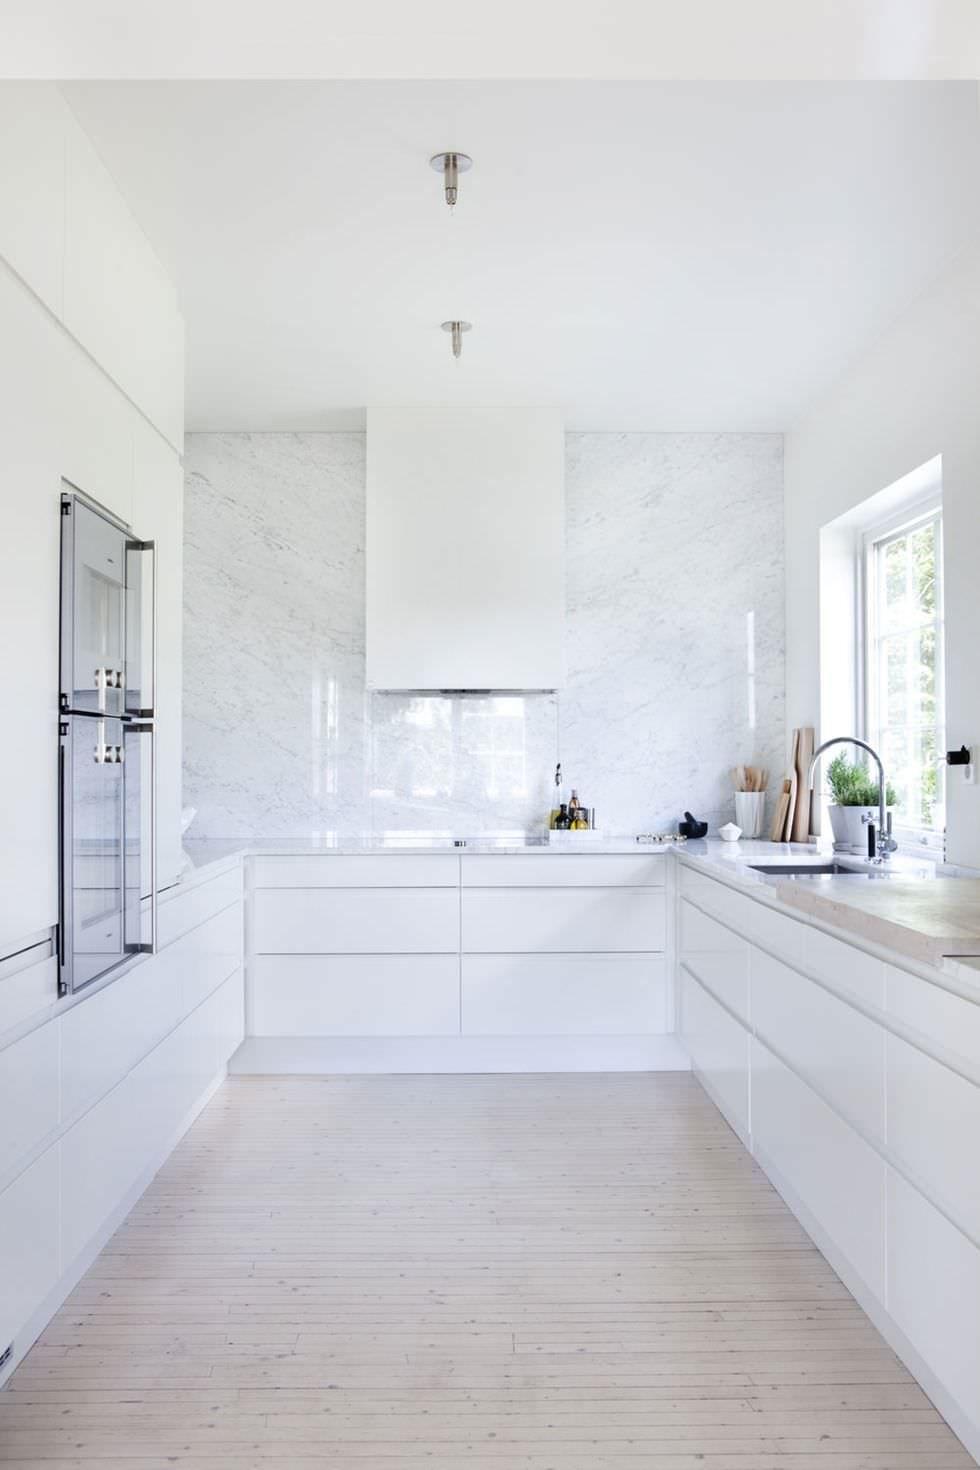 100 idee cucine moderne • Stile e design per la cucina perfetta | I ...